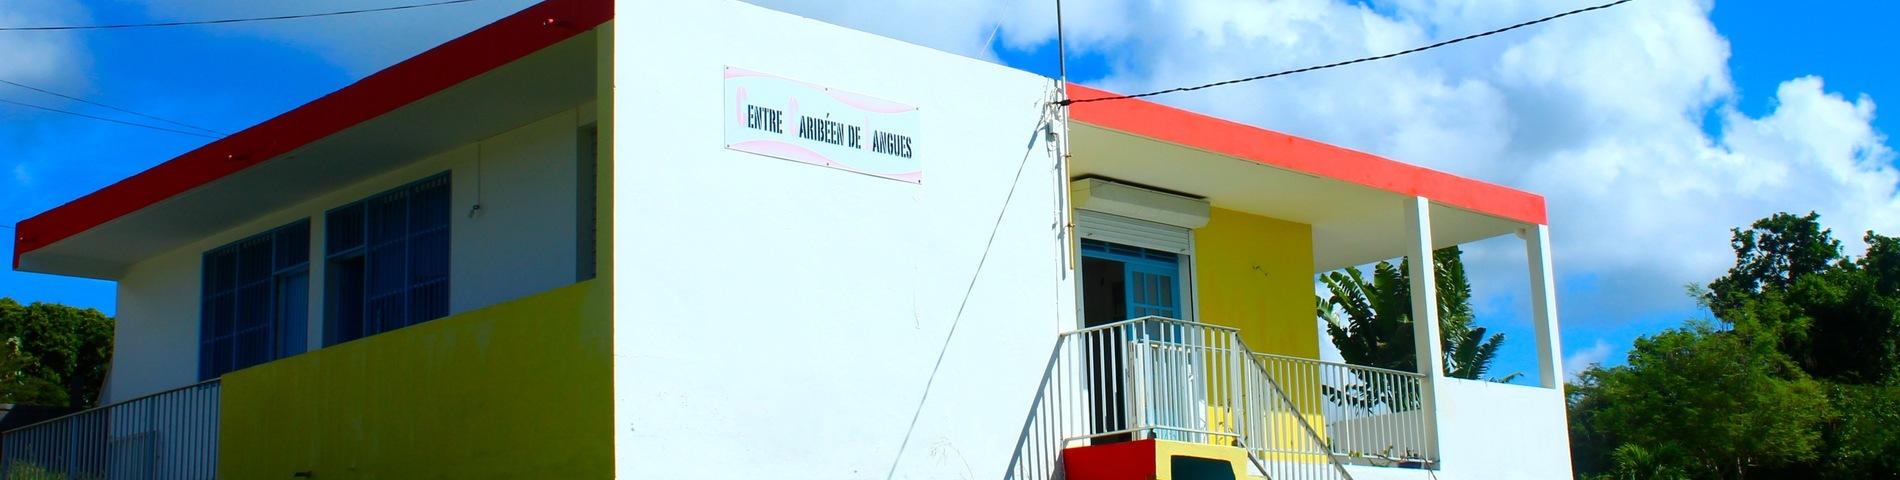 Centre Caribéen de Langues bilde 1